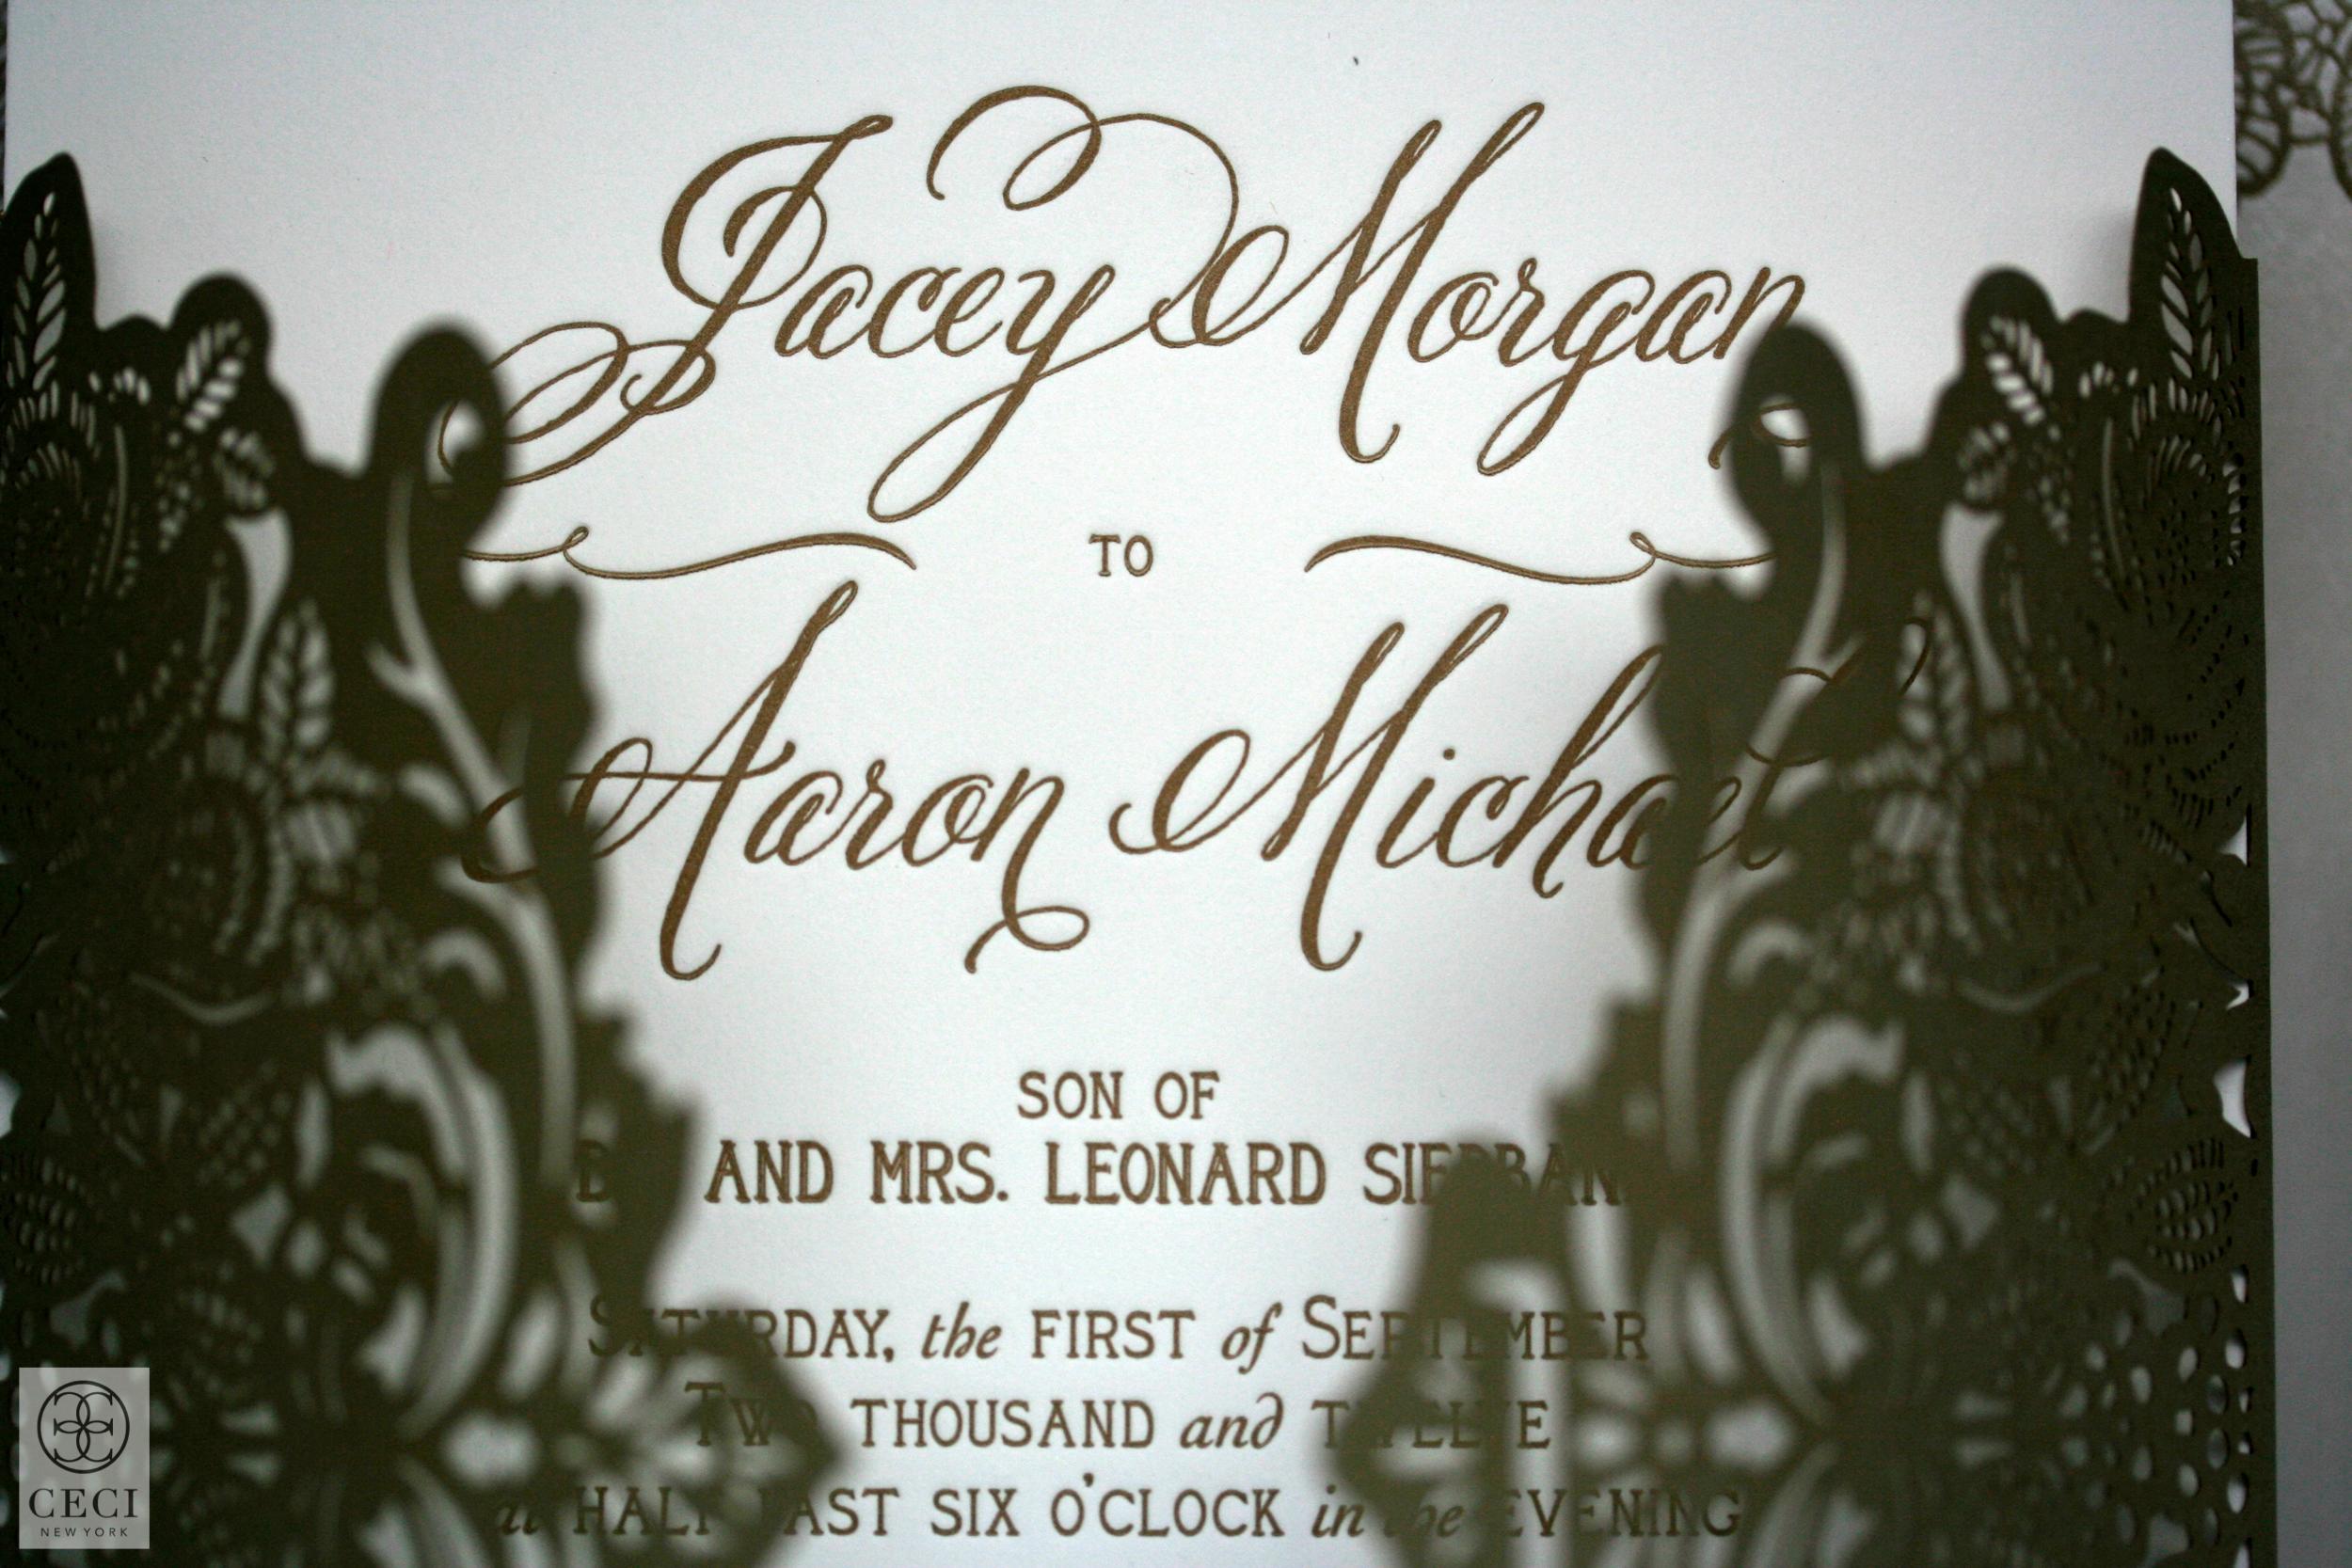 Ceci_New_York_Ceci_Style_Ceci_Johnson_Luxury_Lifestyle_Floral_Lace_Wedding_Letterpress_Inspiration_Design_Custom_Couture_Personalized_Invitations_-2.jpg